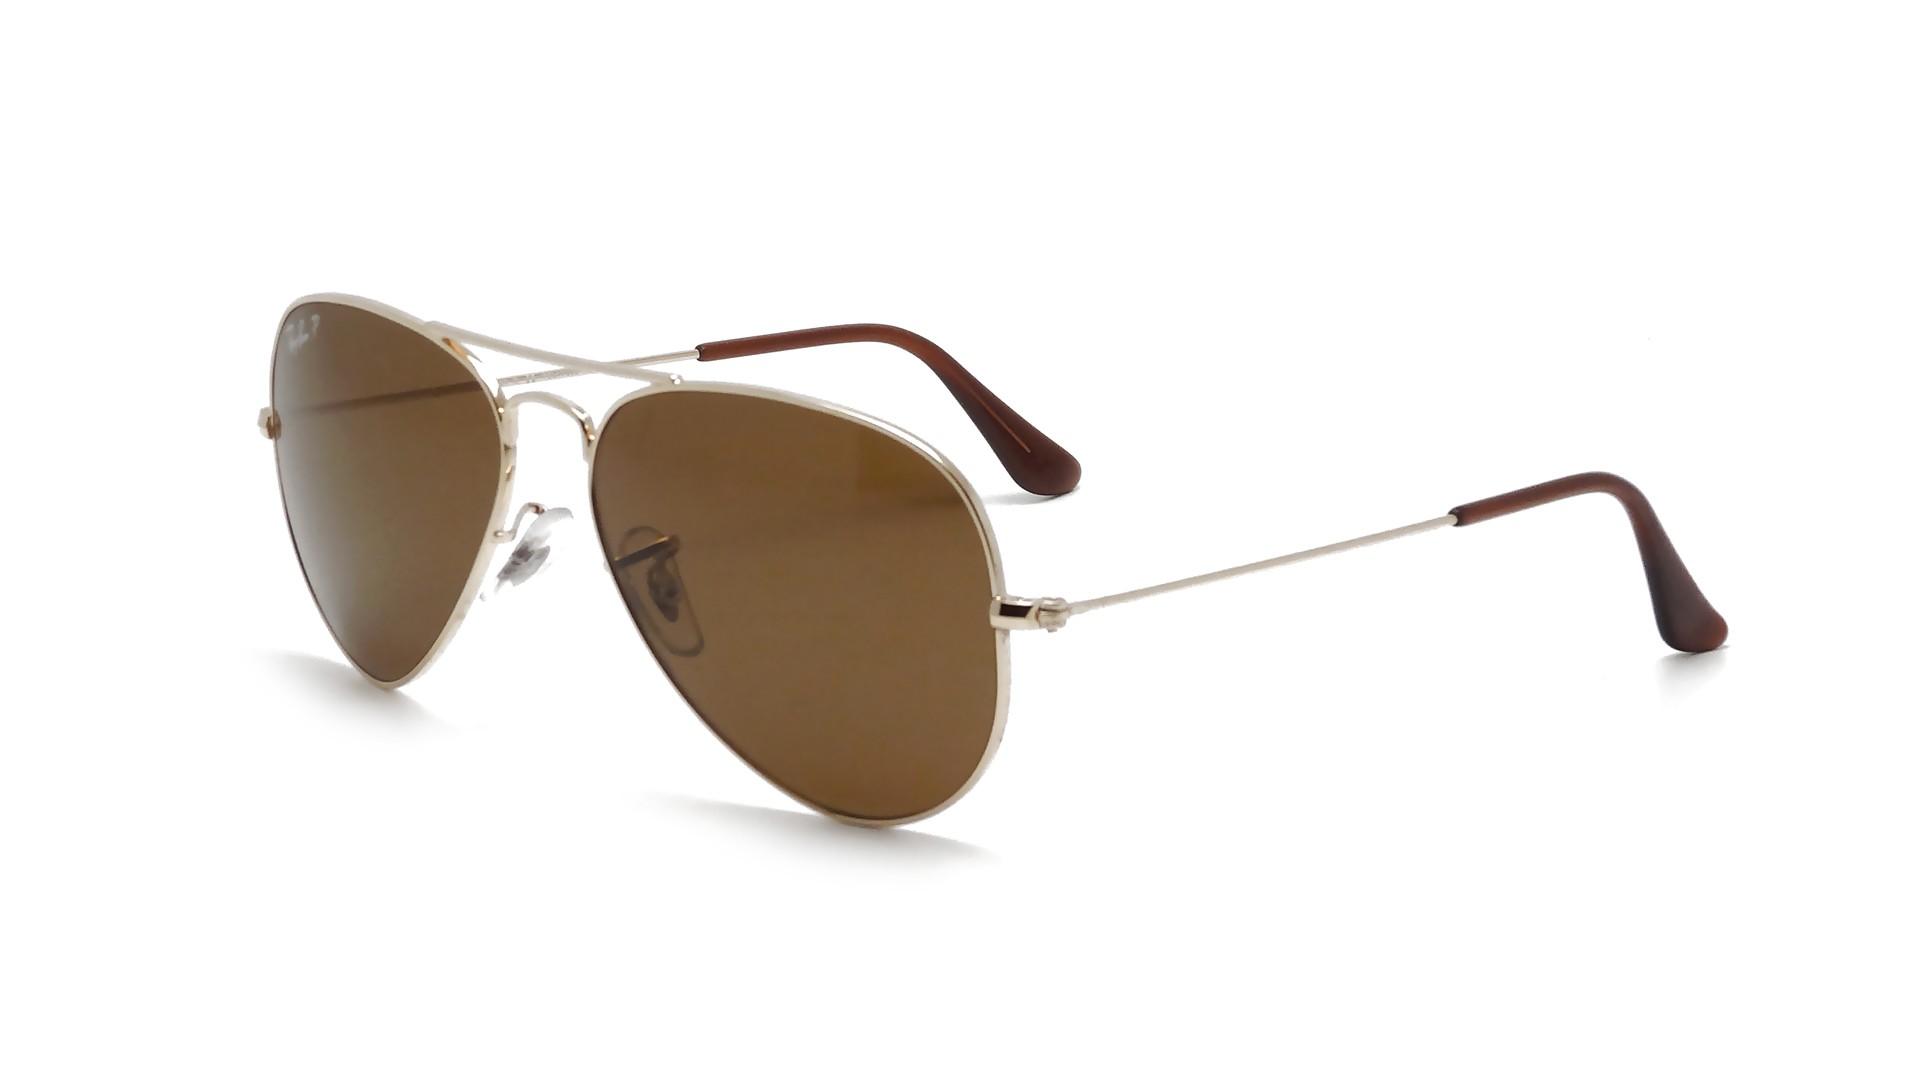 Sunglasses Ray-Ban Aviator Large Metal Gold RB3025 001 57 62-14 Medium  Polarized 45fb4ccbeacdb